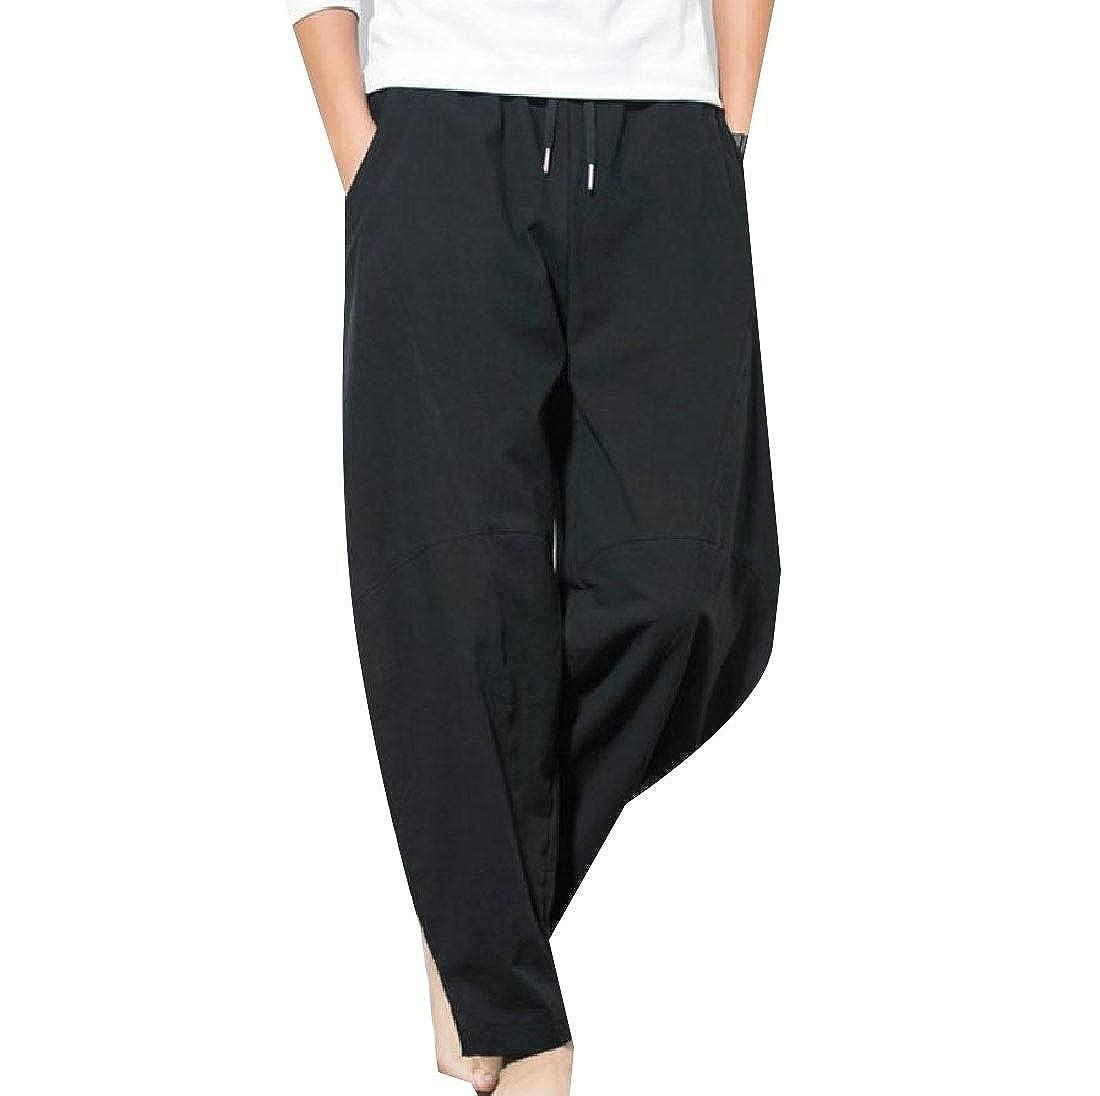 YUNY Men Athletic Wide-Leg Oversized Casual Flexible Fit Harem Pants Black 3XL